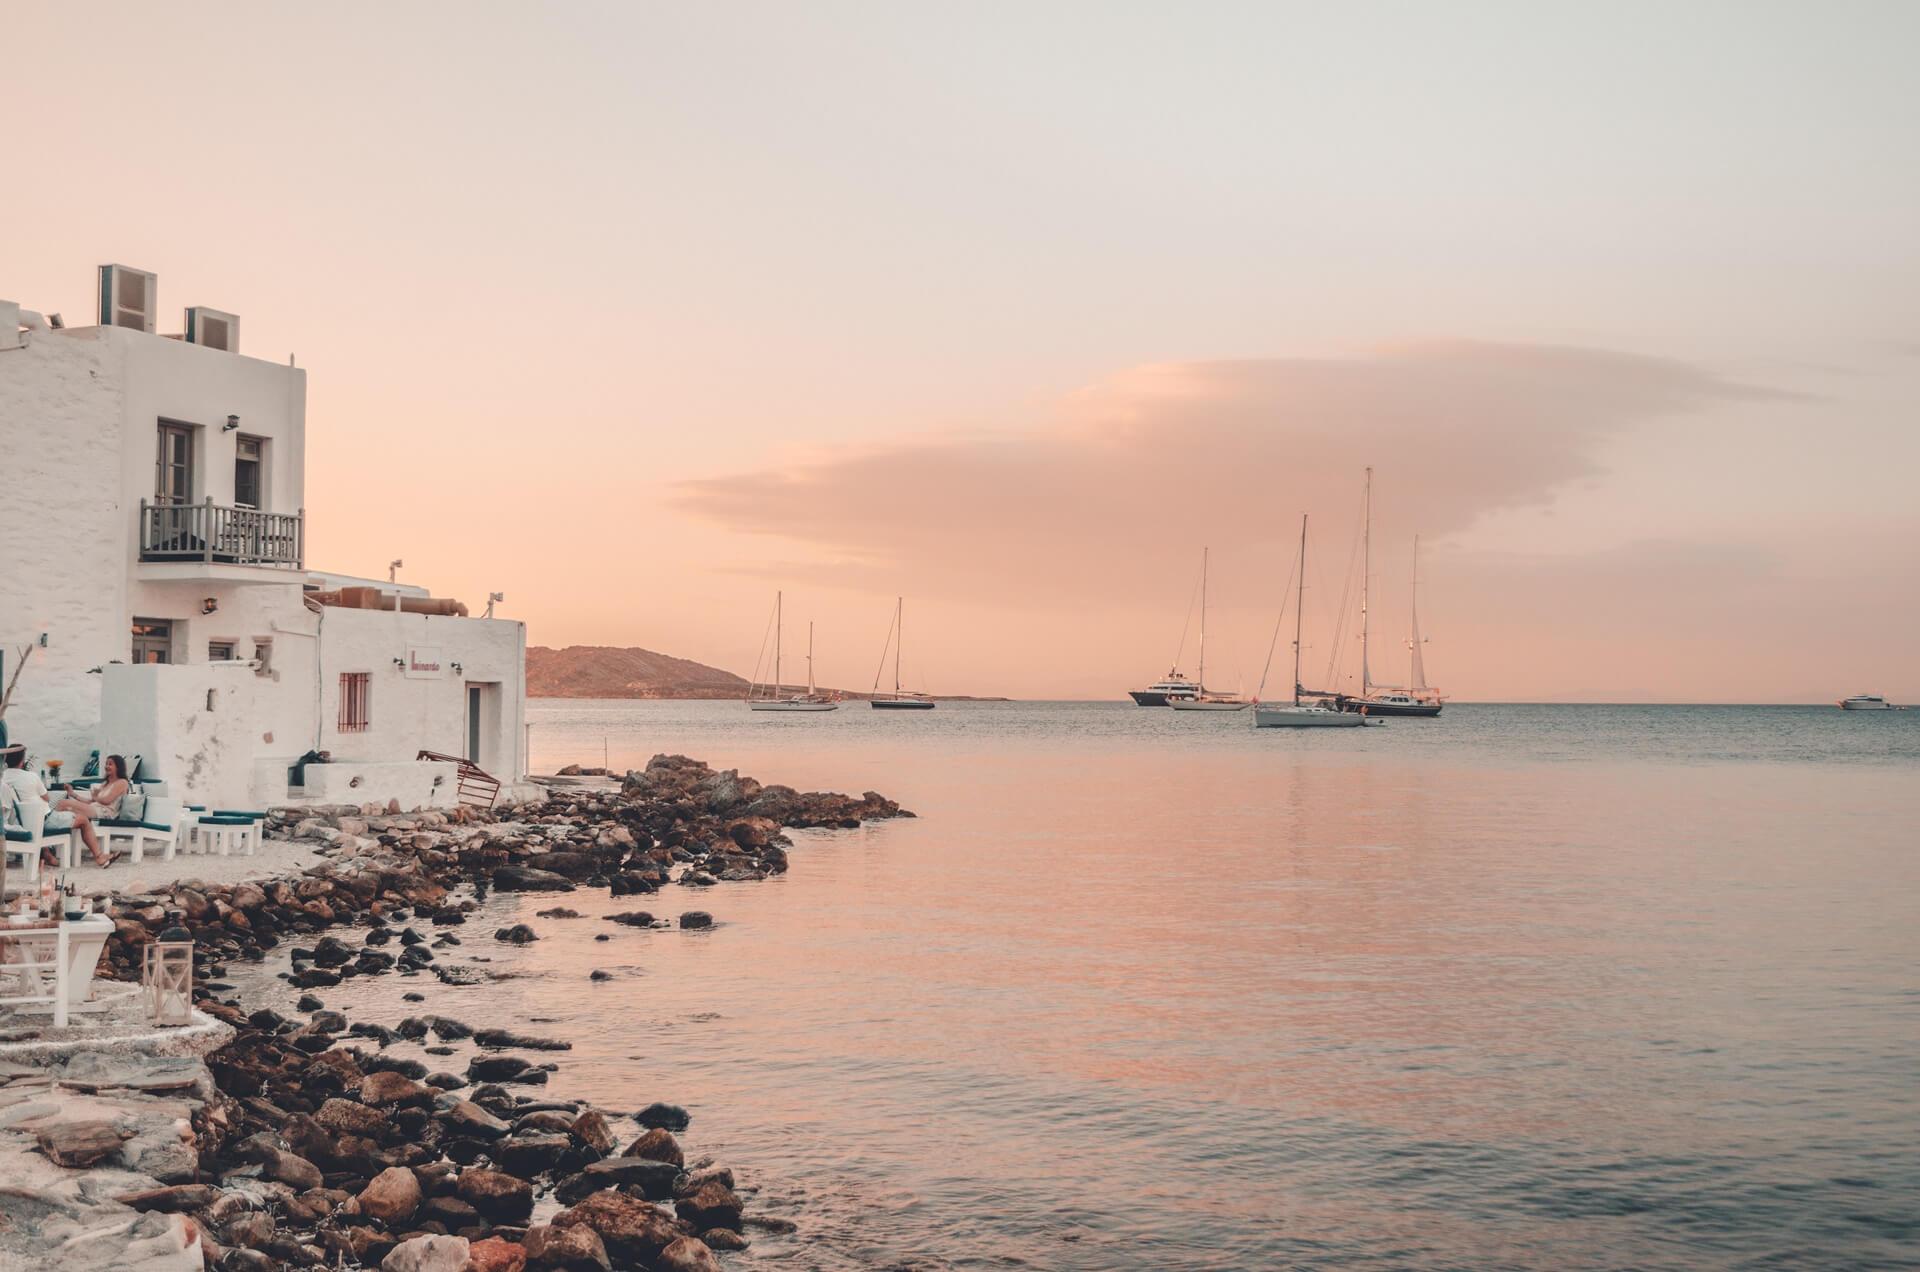 paros-central-greece-la-vie-en-blog-all-rights-reserved